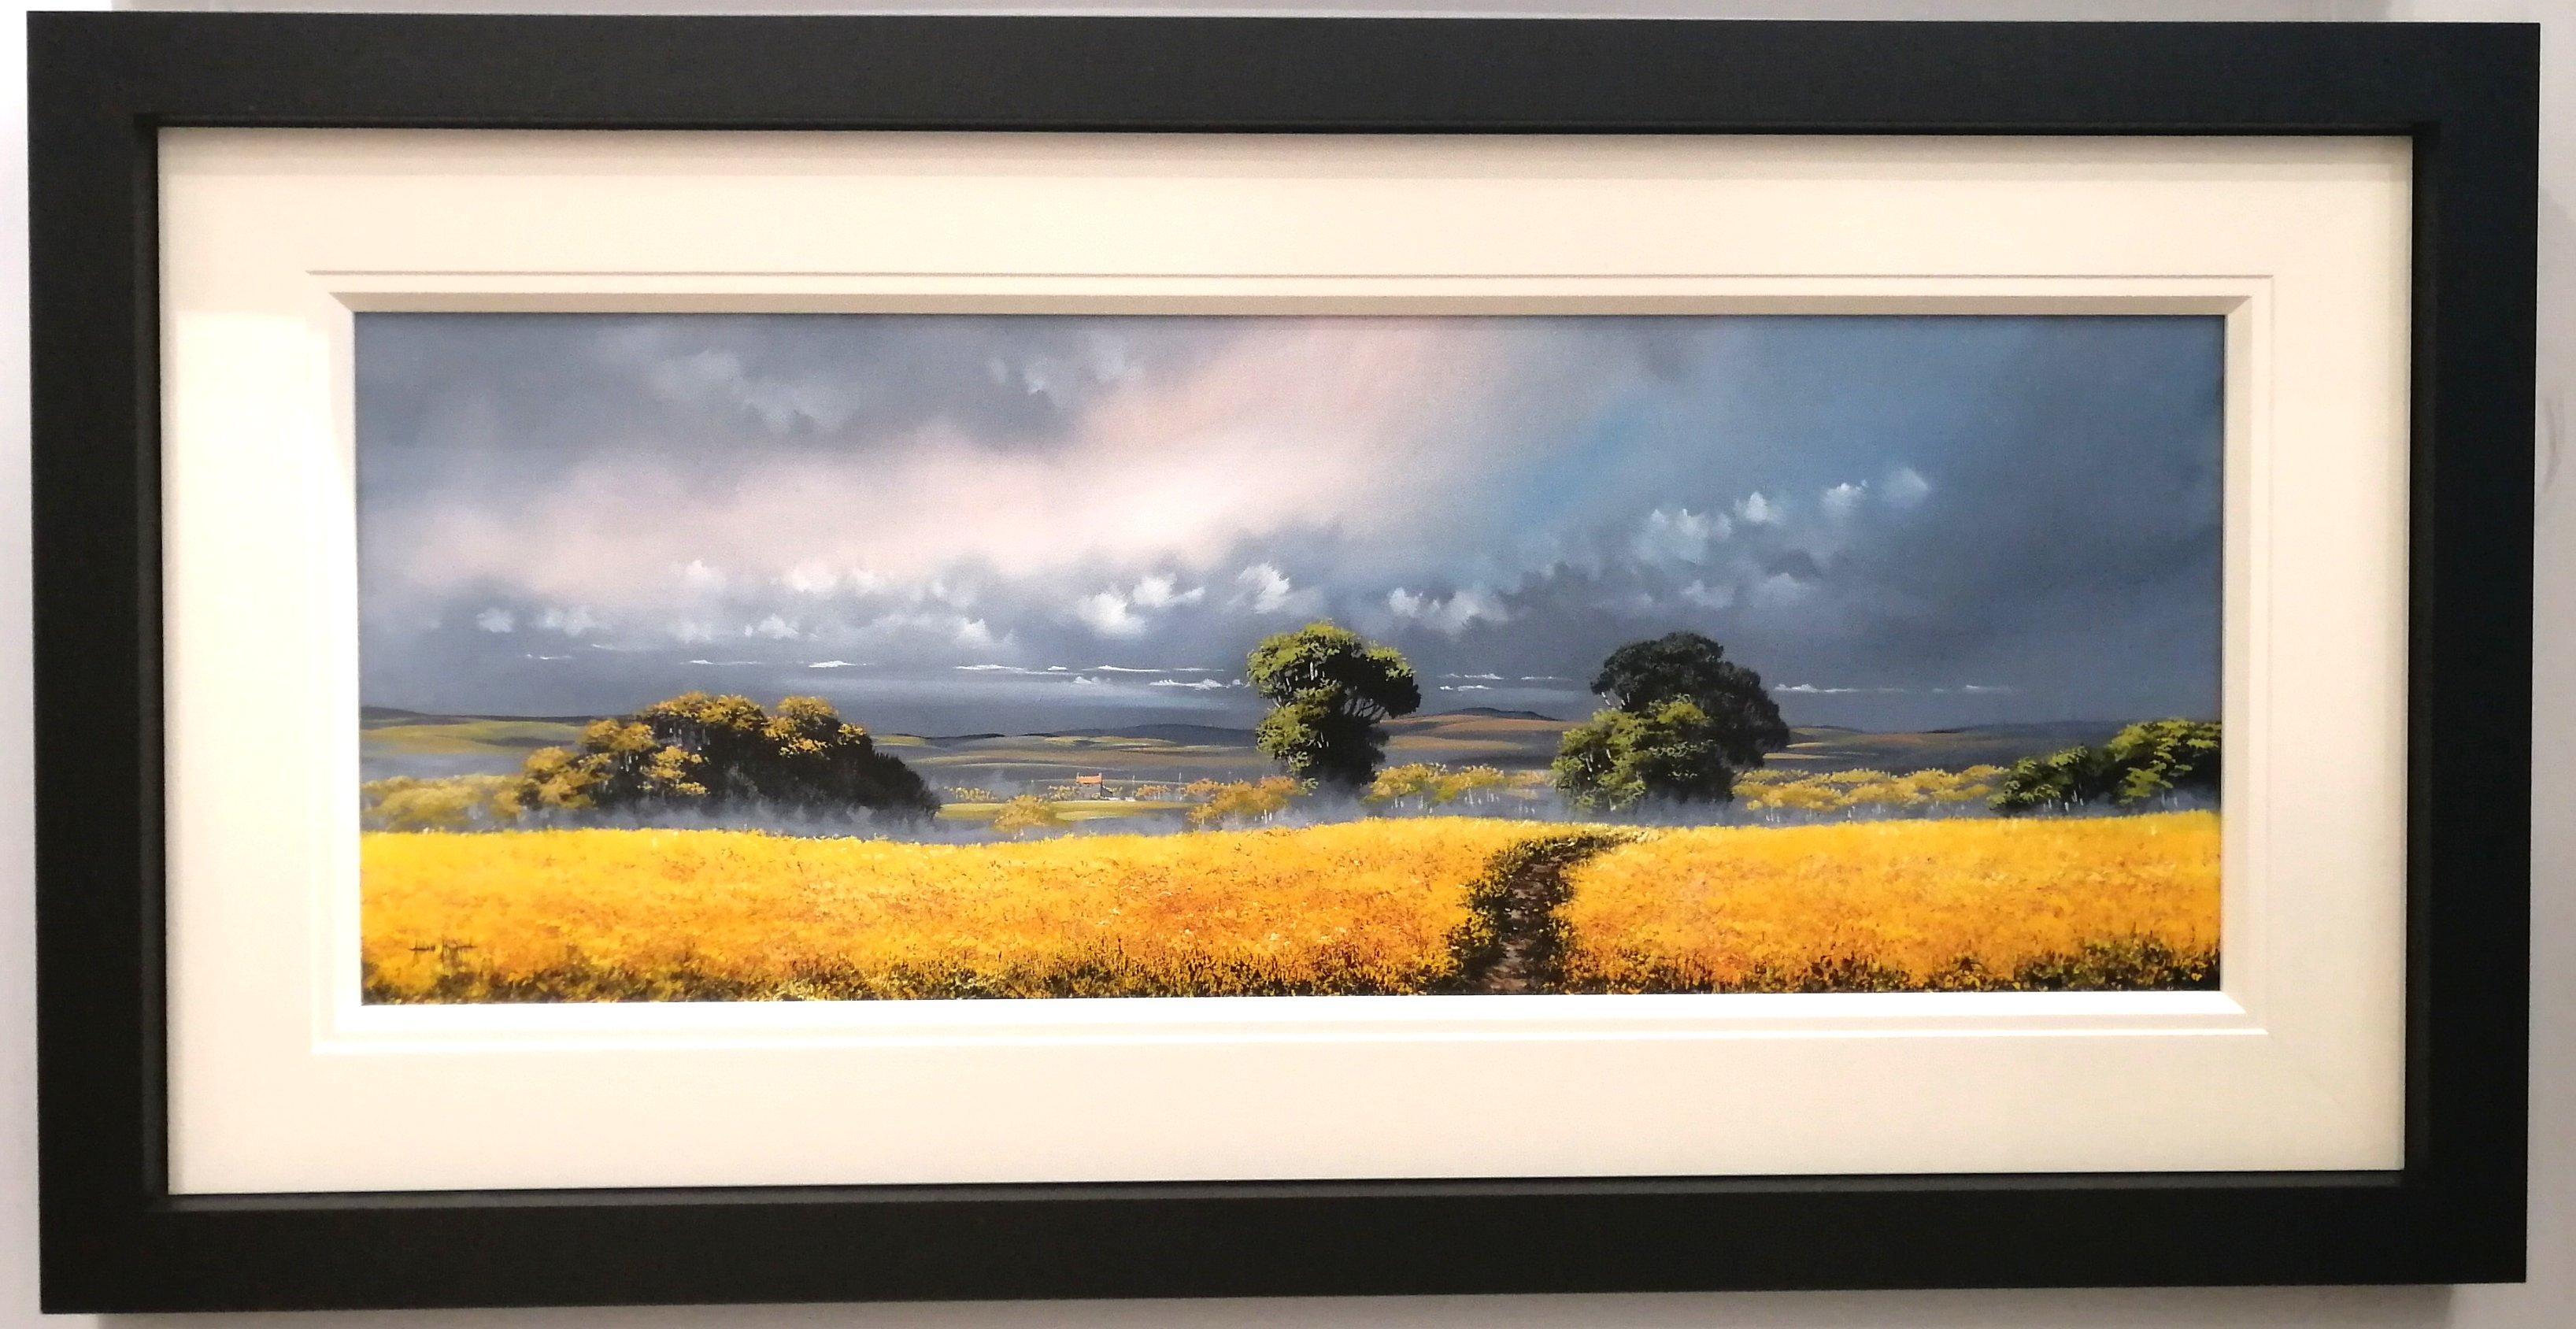 Golden Pathway II (40x15) by Allan Morgan